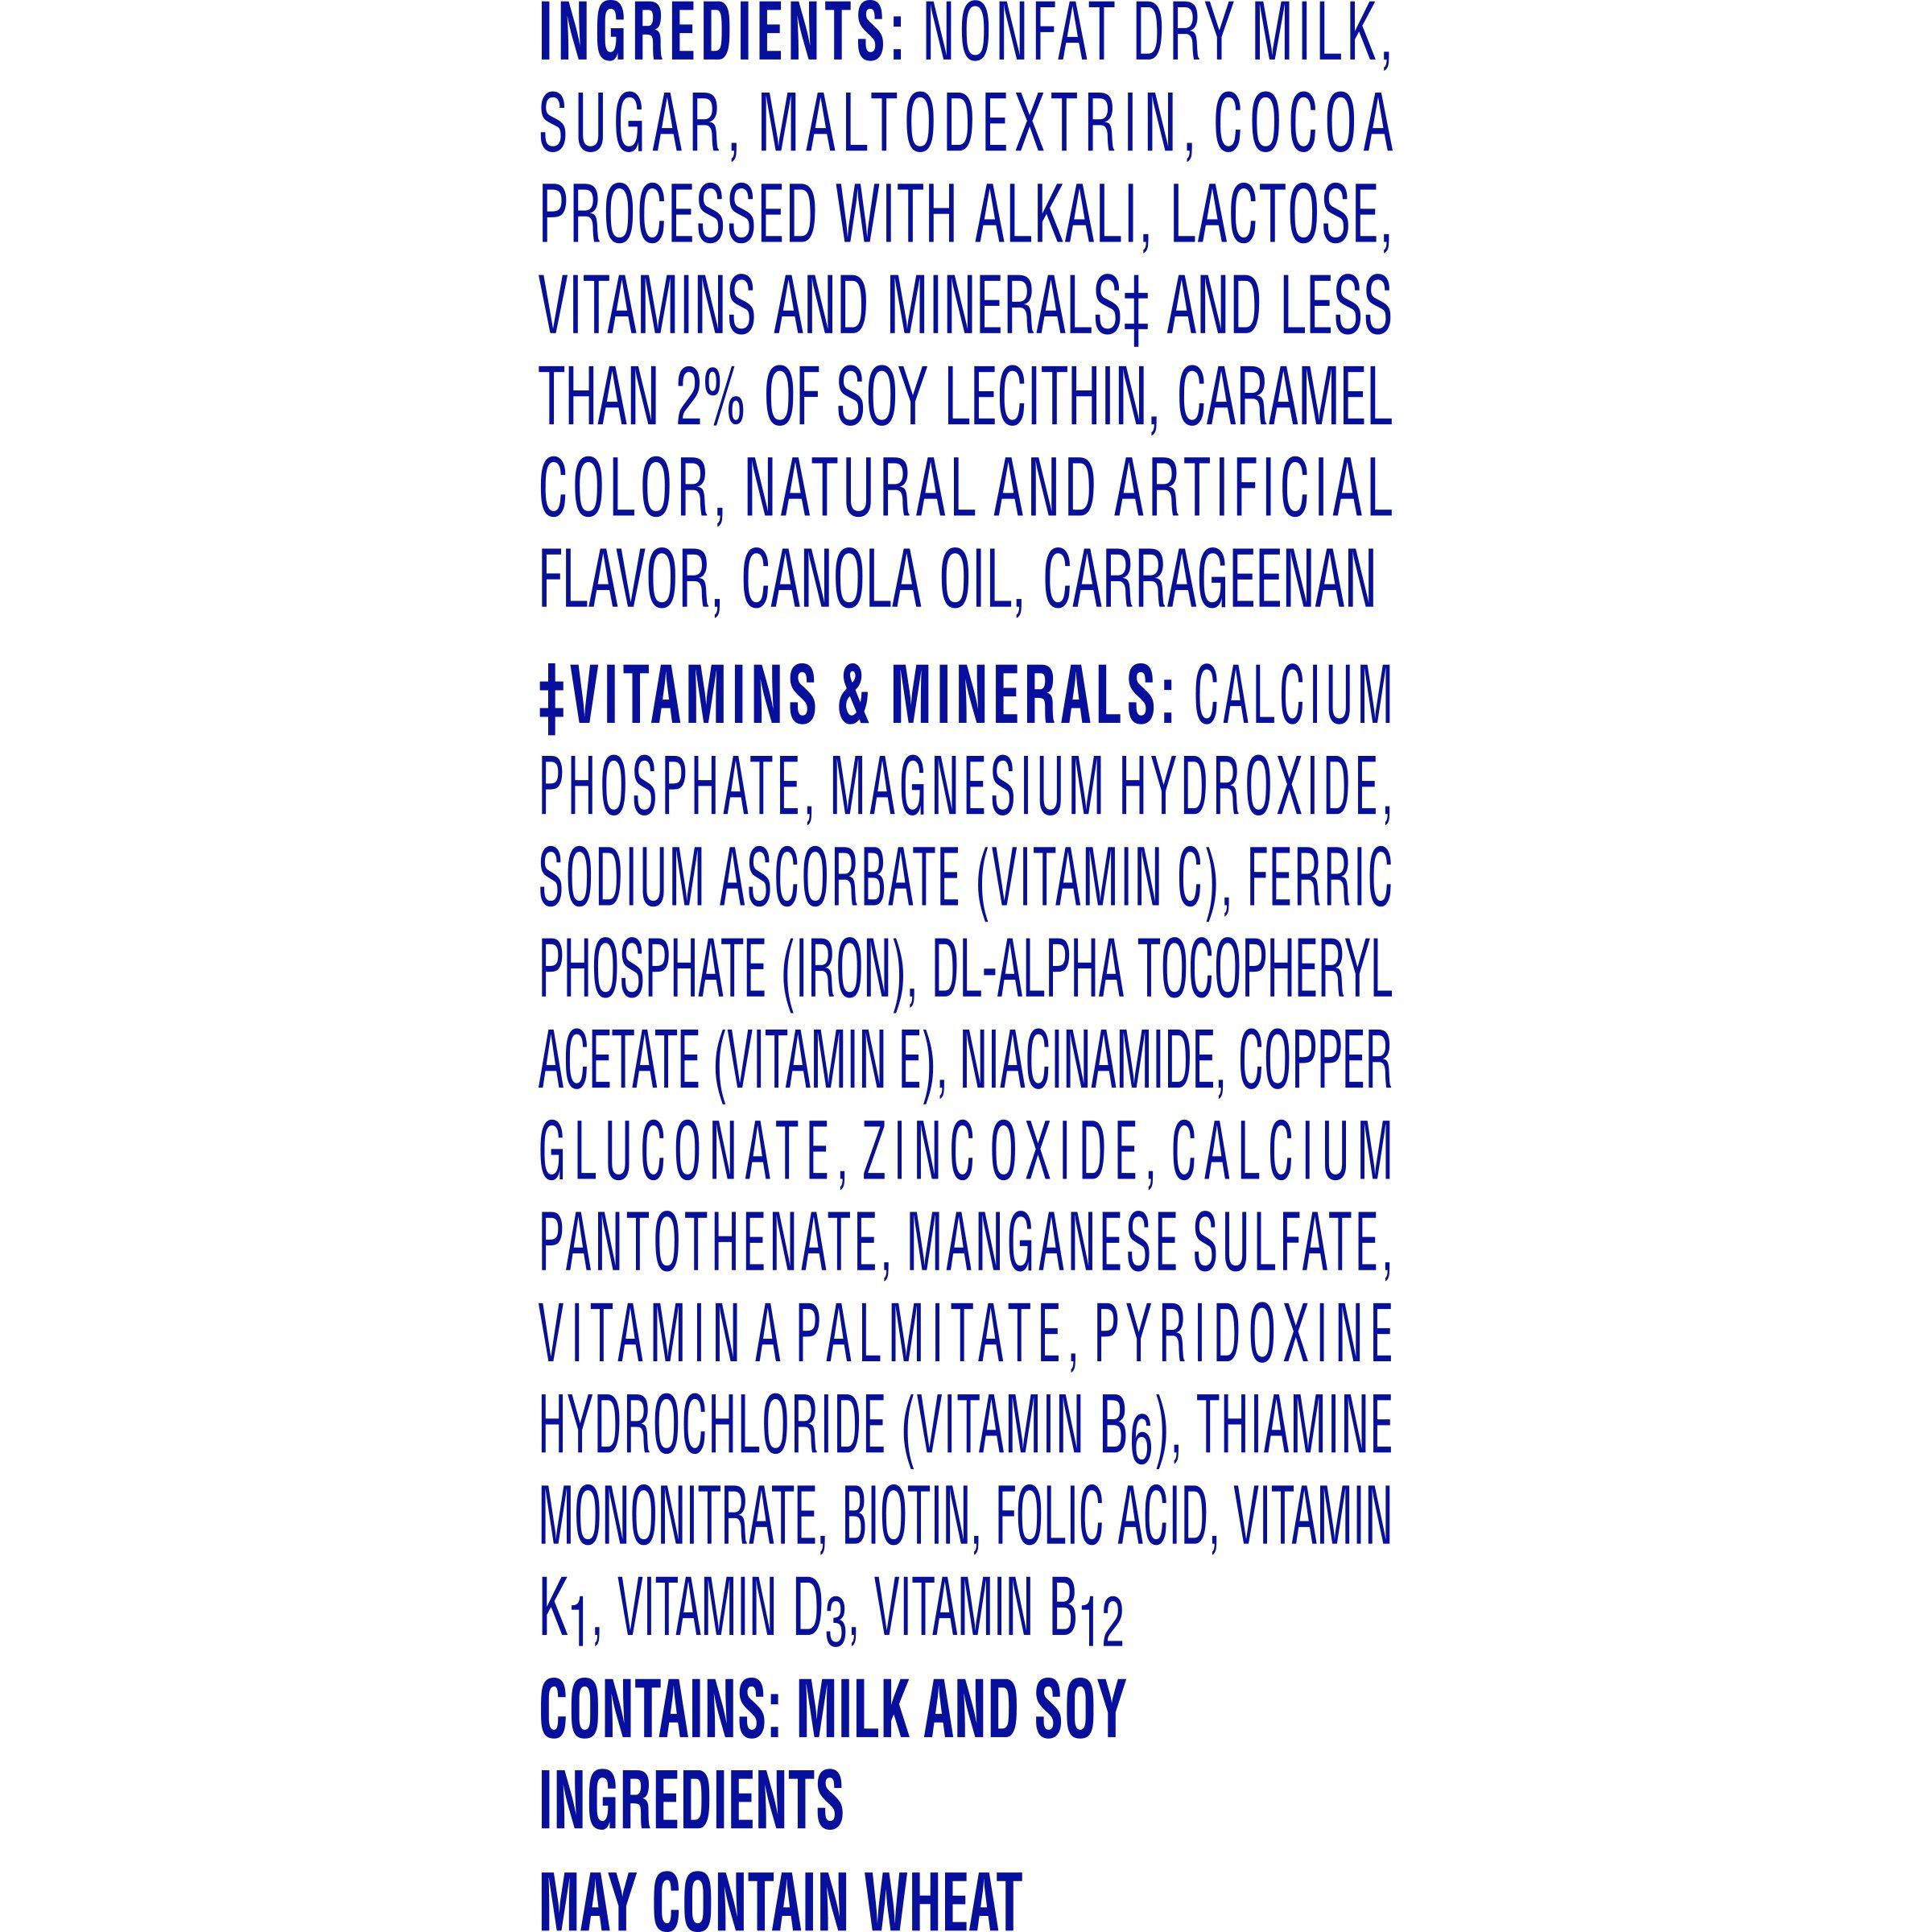 Carnation Breakfast Essentials Powder Drink Mix, Dark Chocolate, 10 Count Box of 1.26 oz Packets, 6 Pack by Carnation Breakfast Essentials (Image #3)